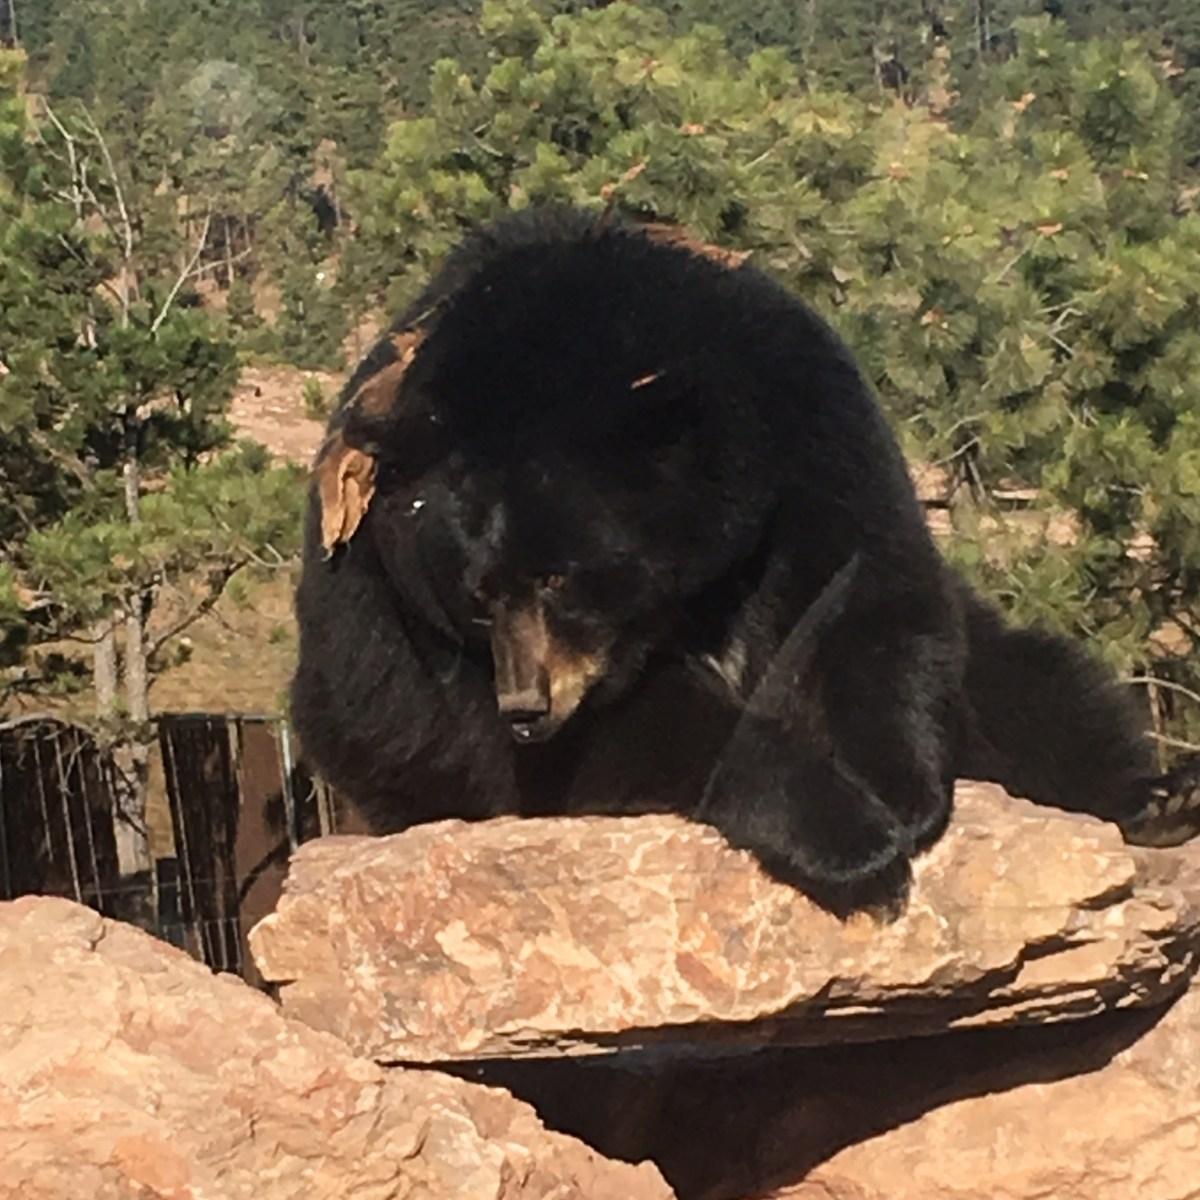 Black Bear at Bear Country USA South Dakota